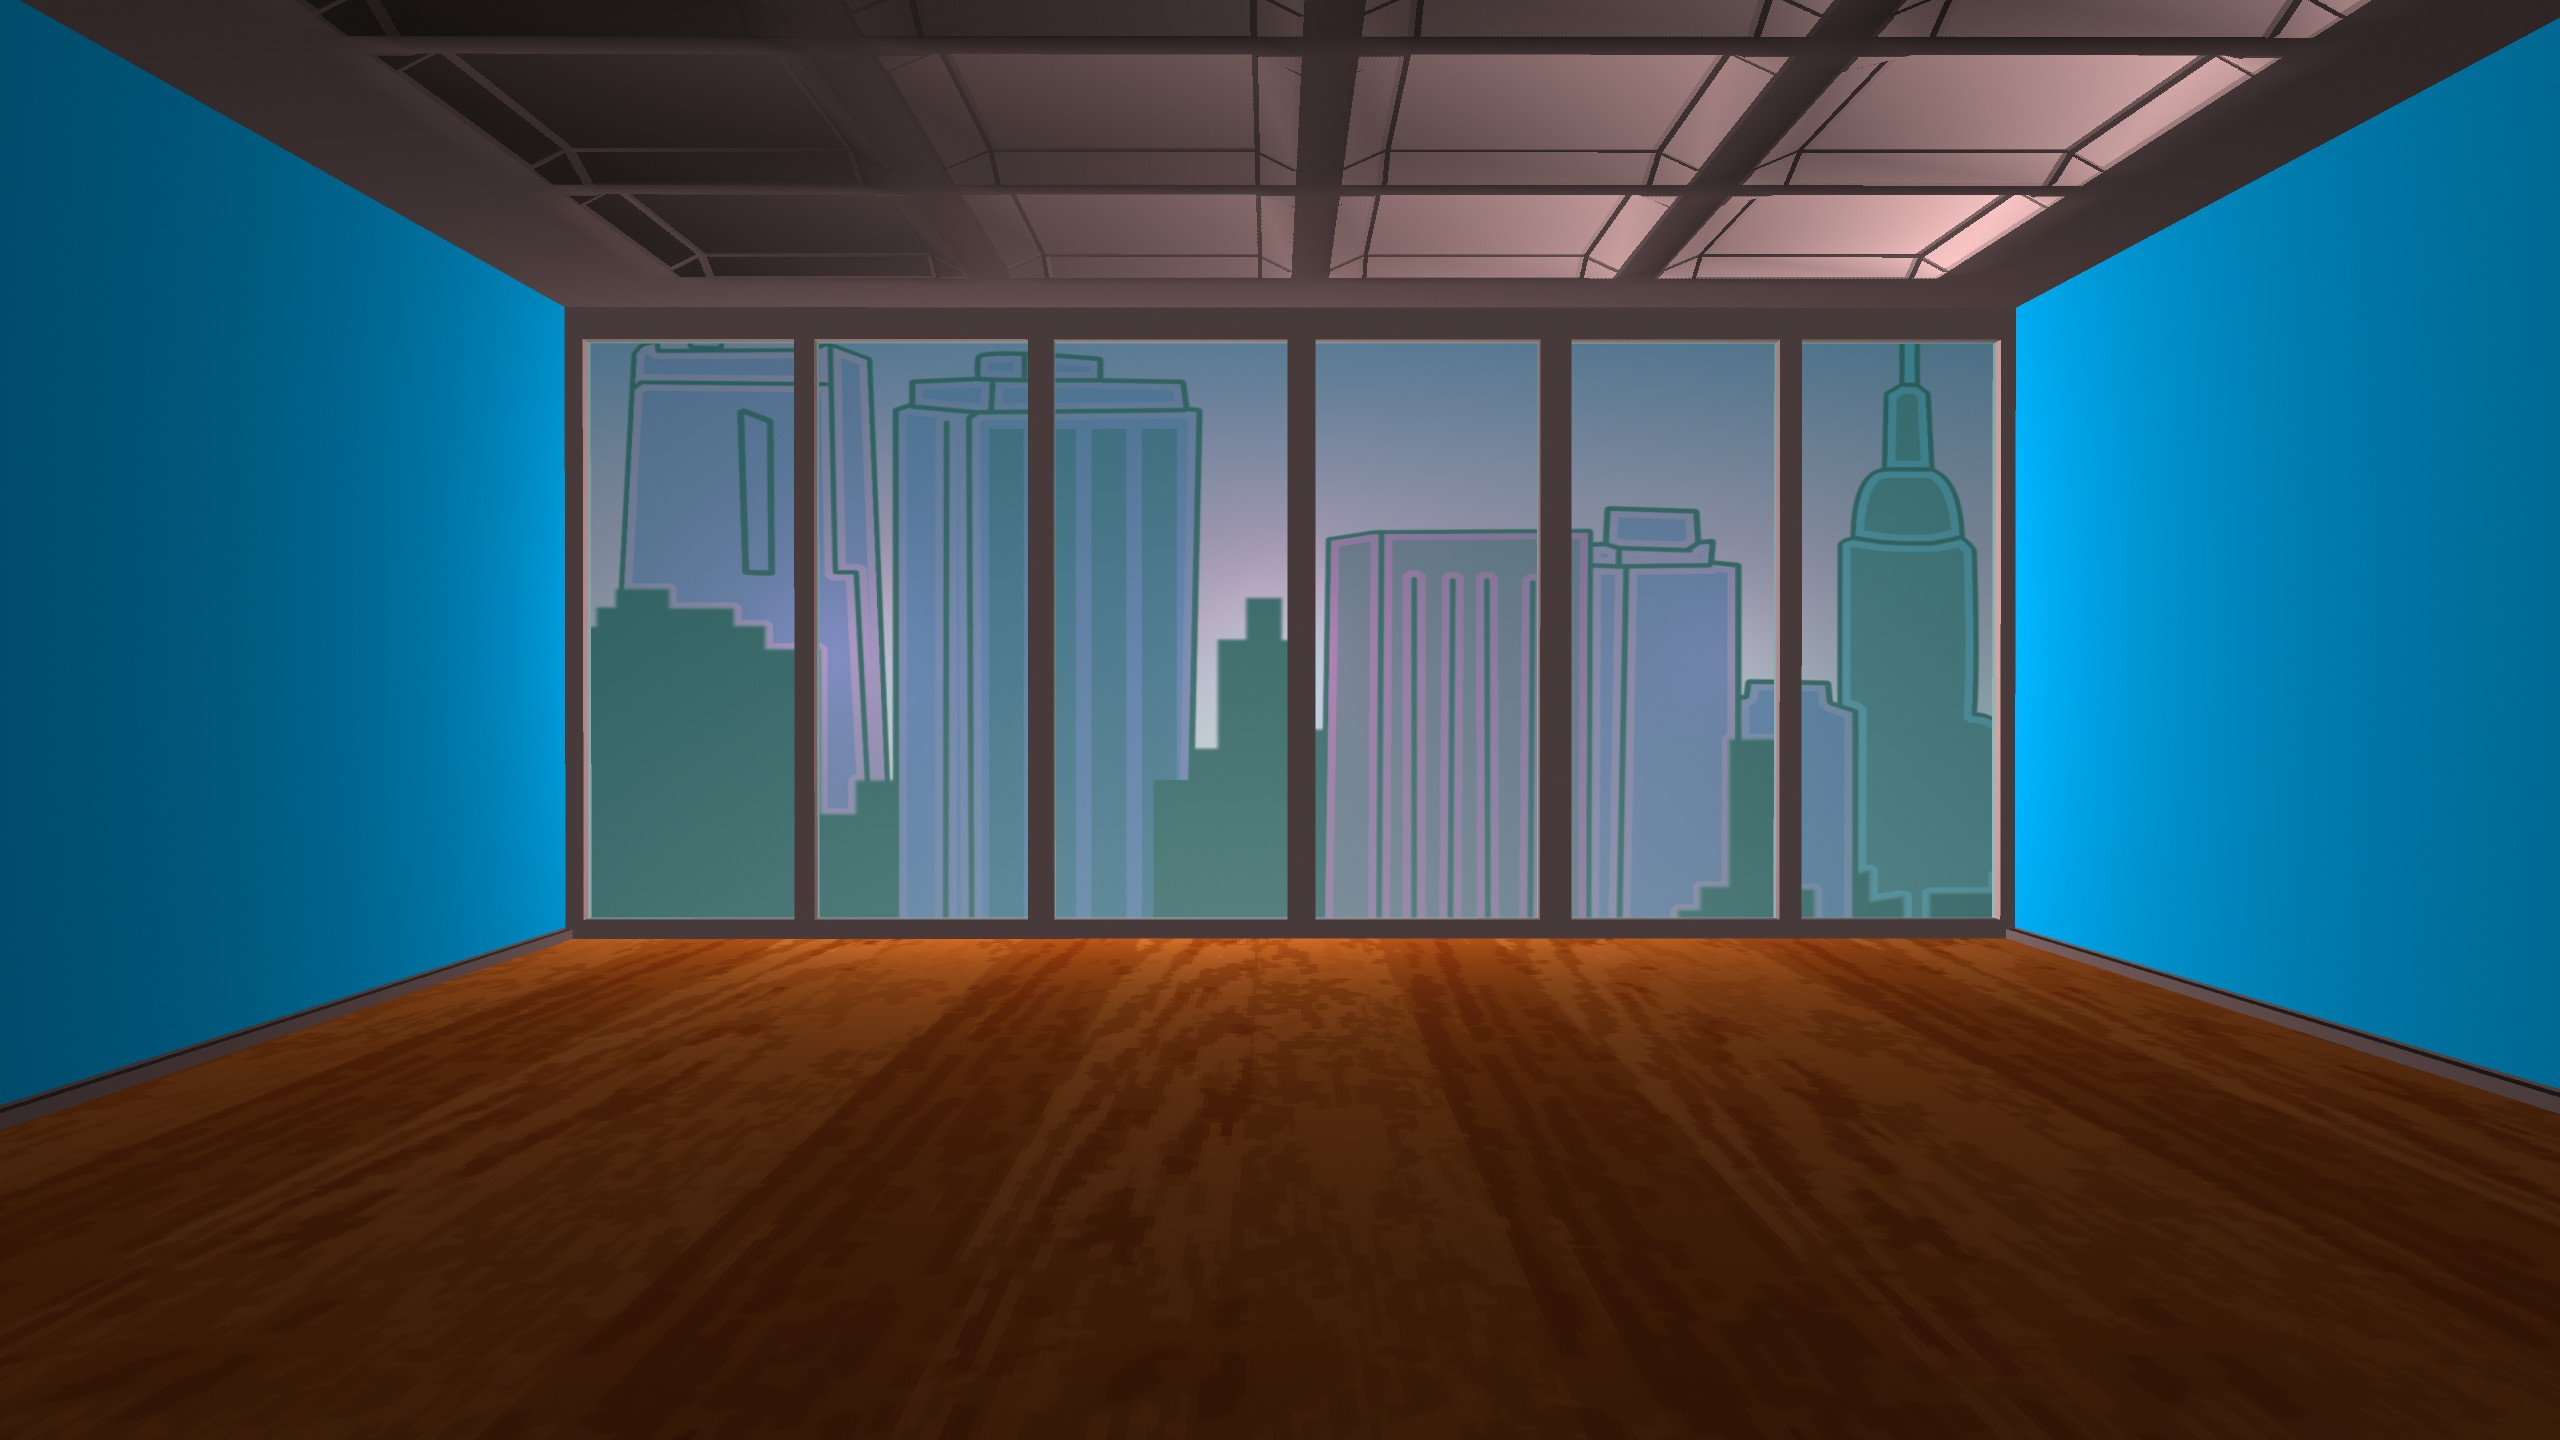 311122 large office background 2560x1440 windows